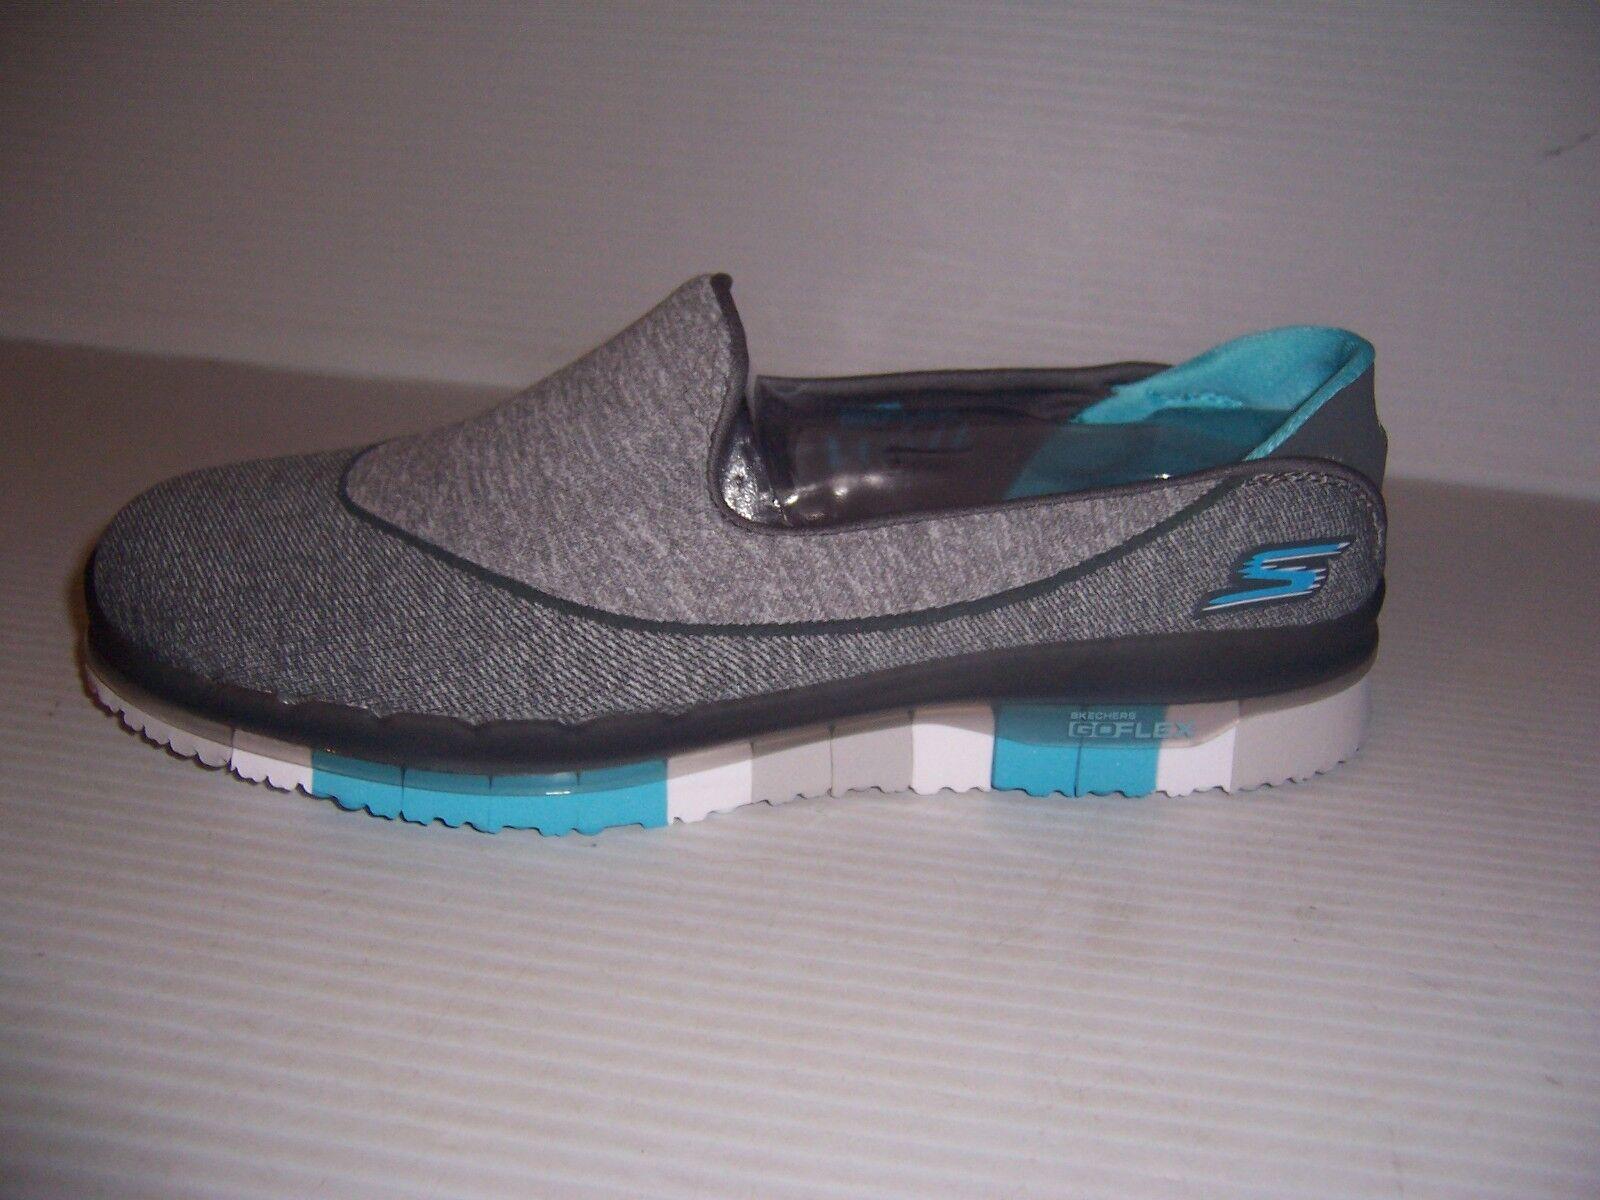 SKECHERS GO FLEX WOMENS CHARCOAL blueE SLIP ON WALKING SHOES VARIOUS SIZES NEW